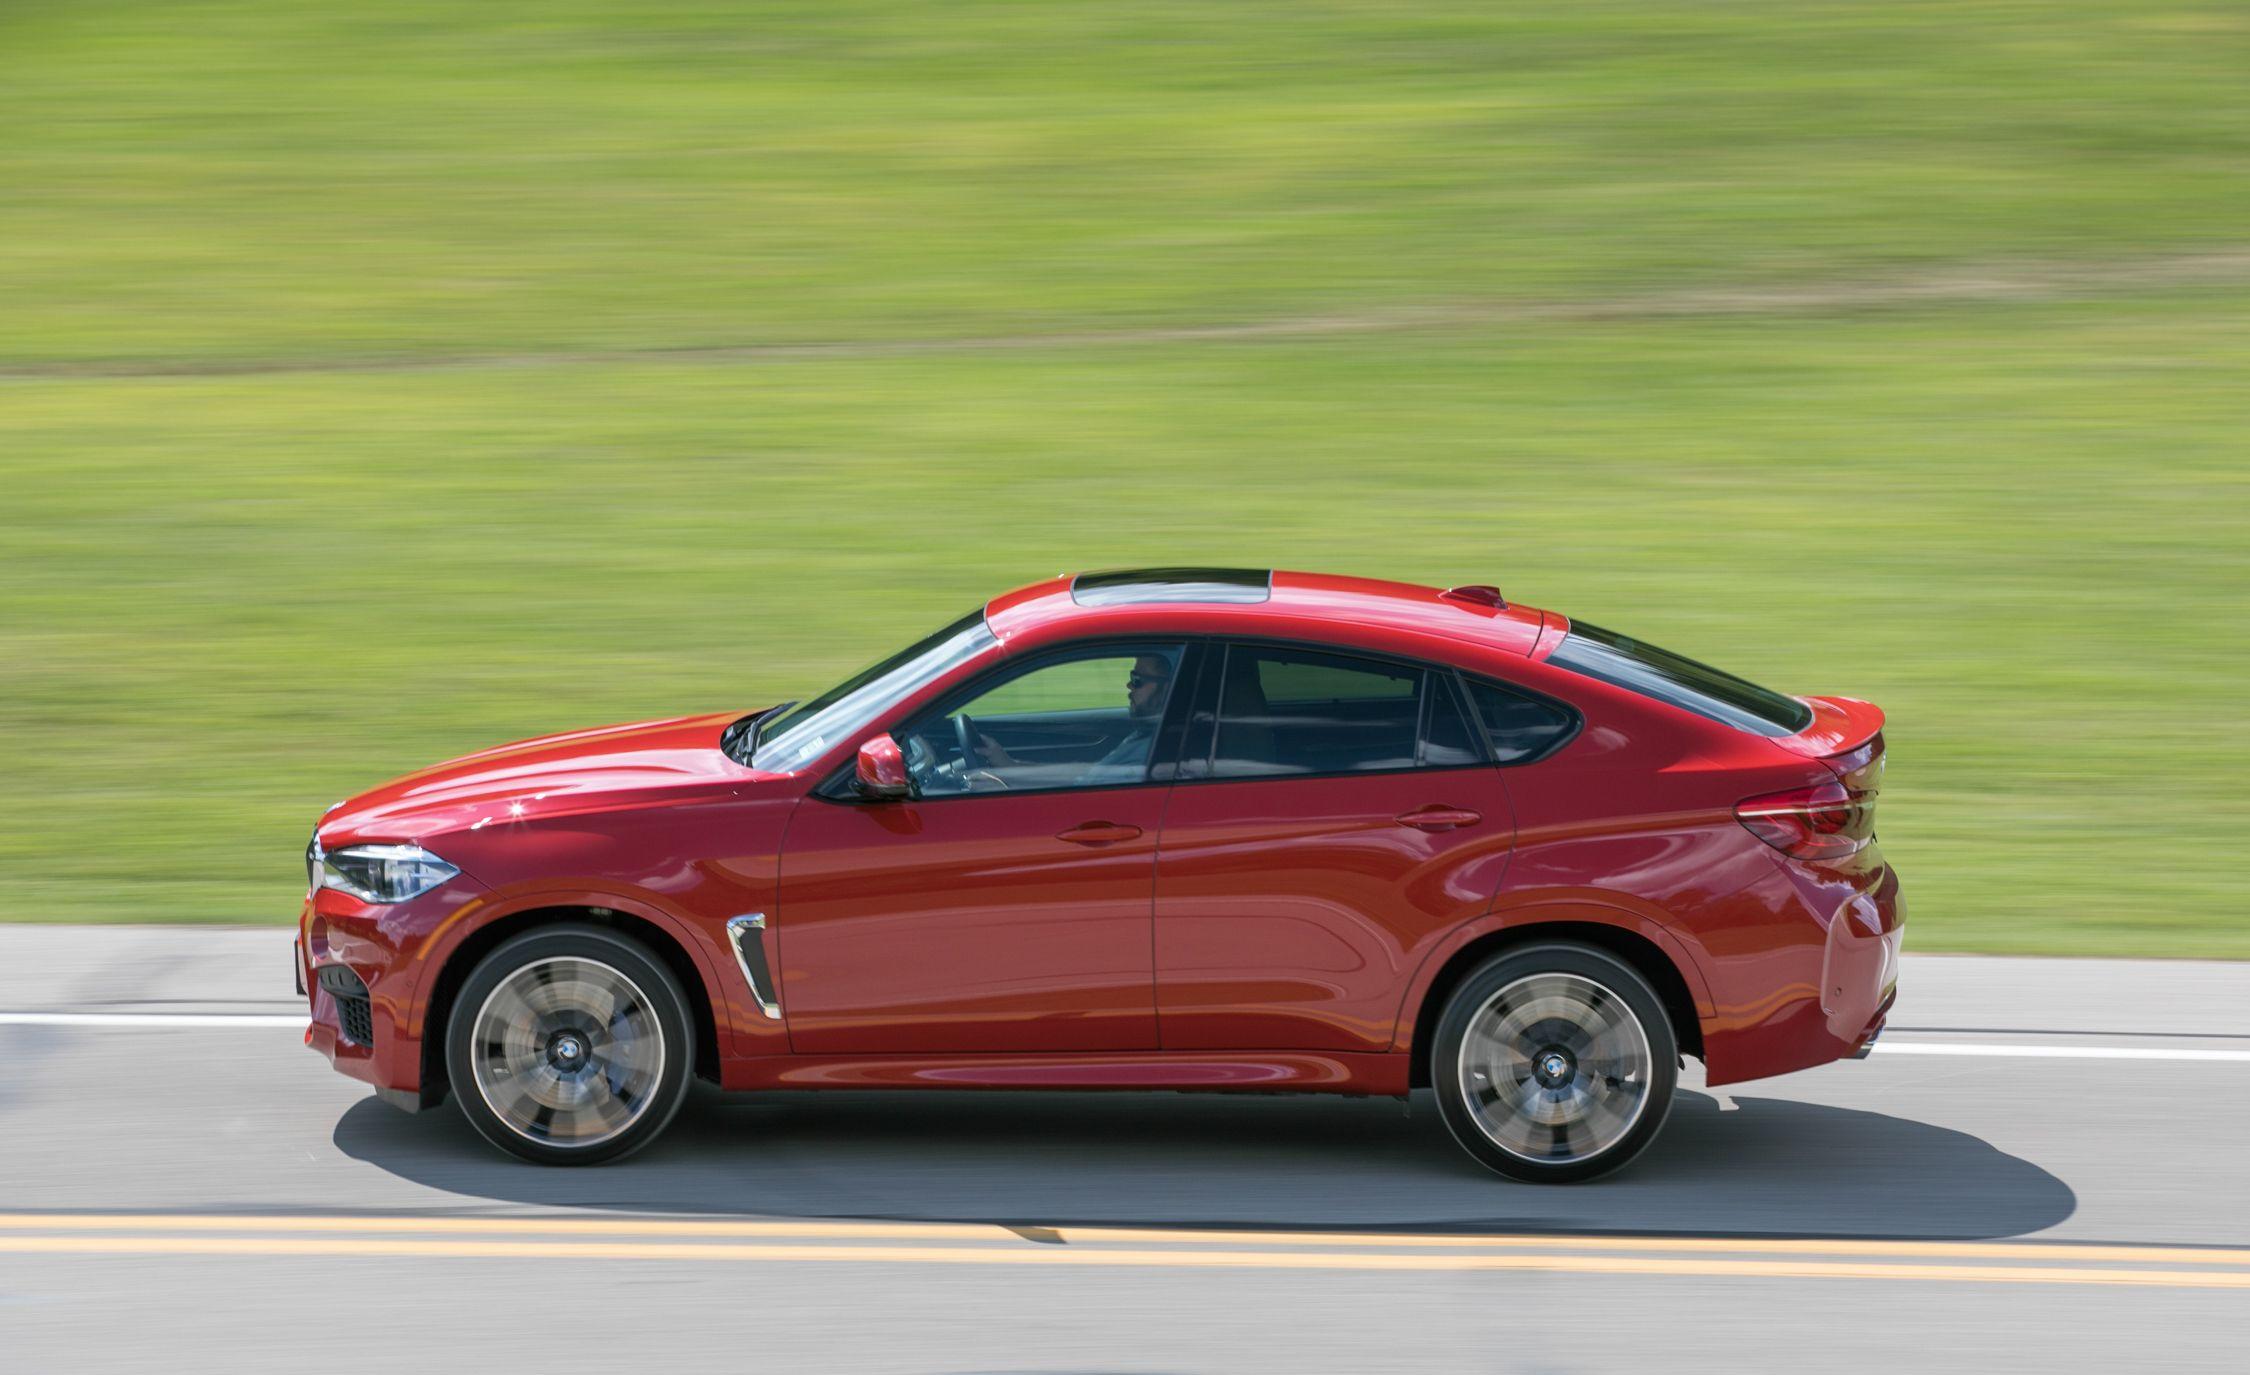 BMW X6 M Reviews BMW X6 M Price s and Specs